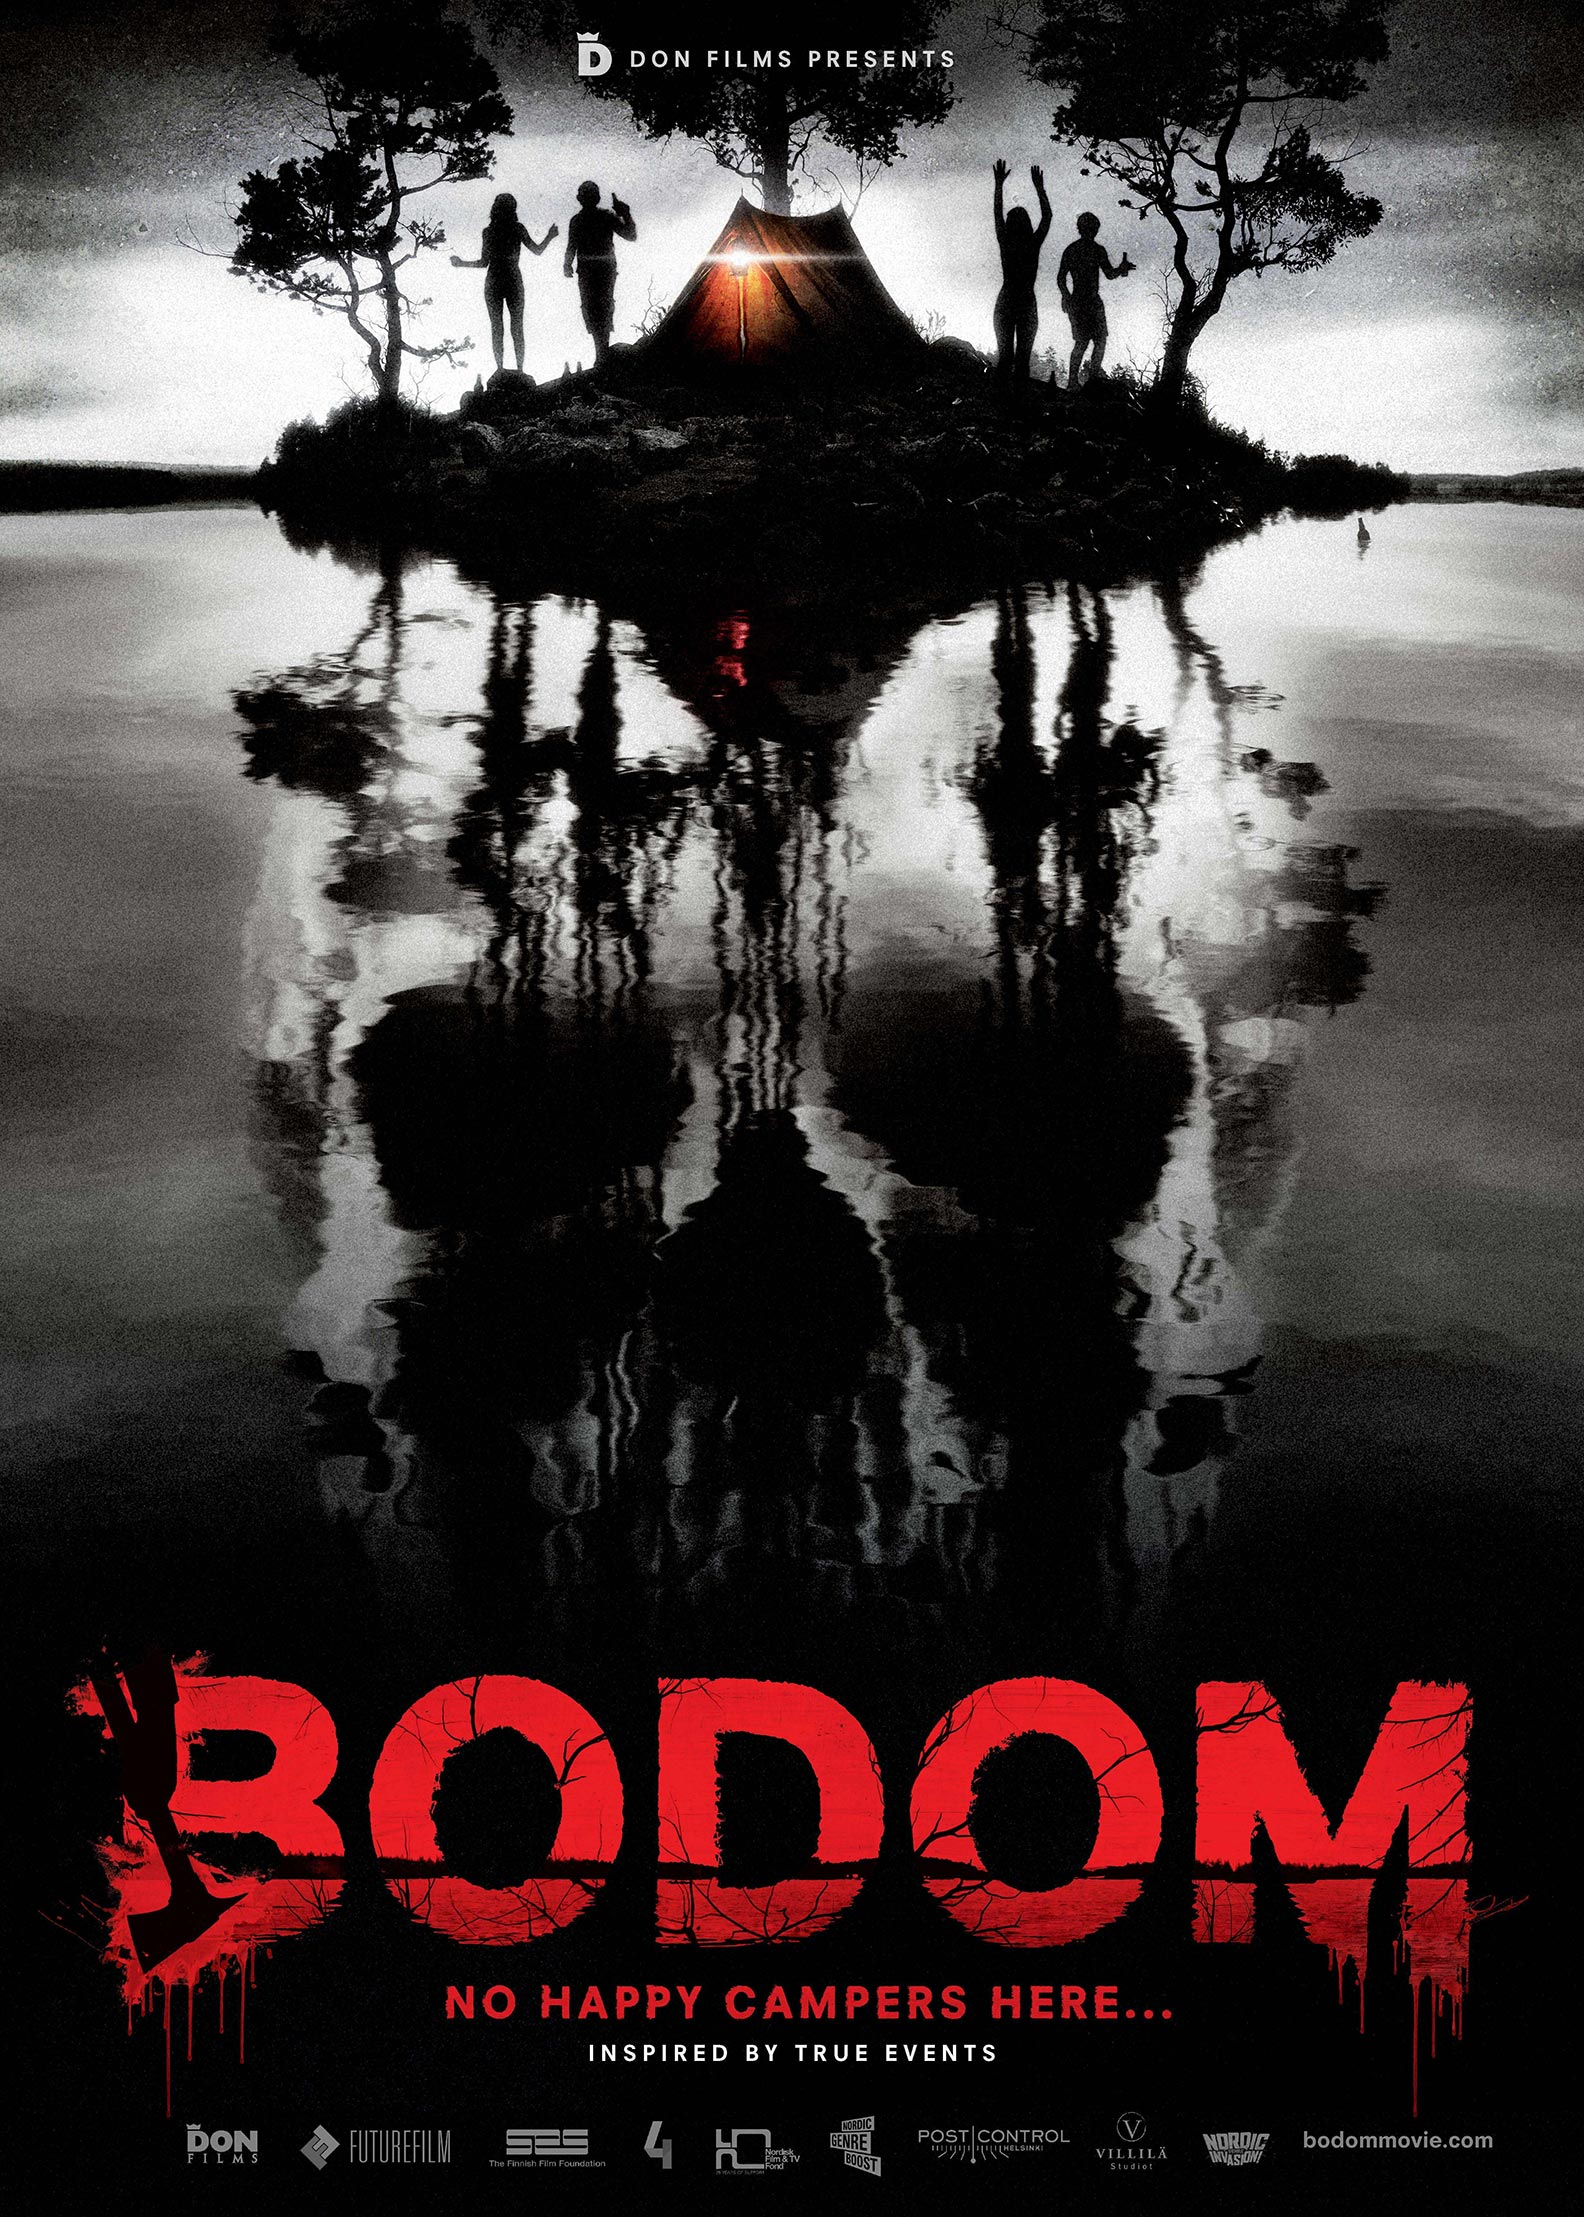 Lake Bodom Film